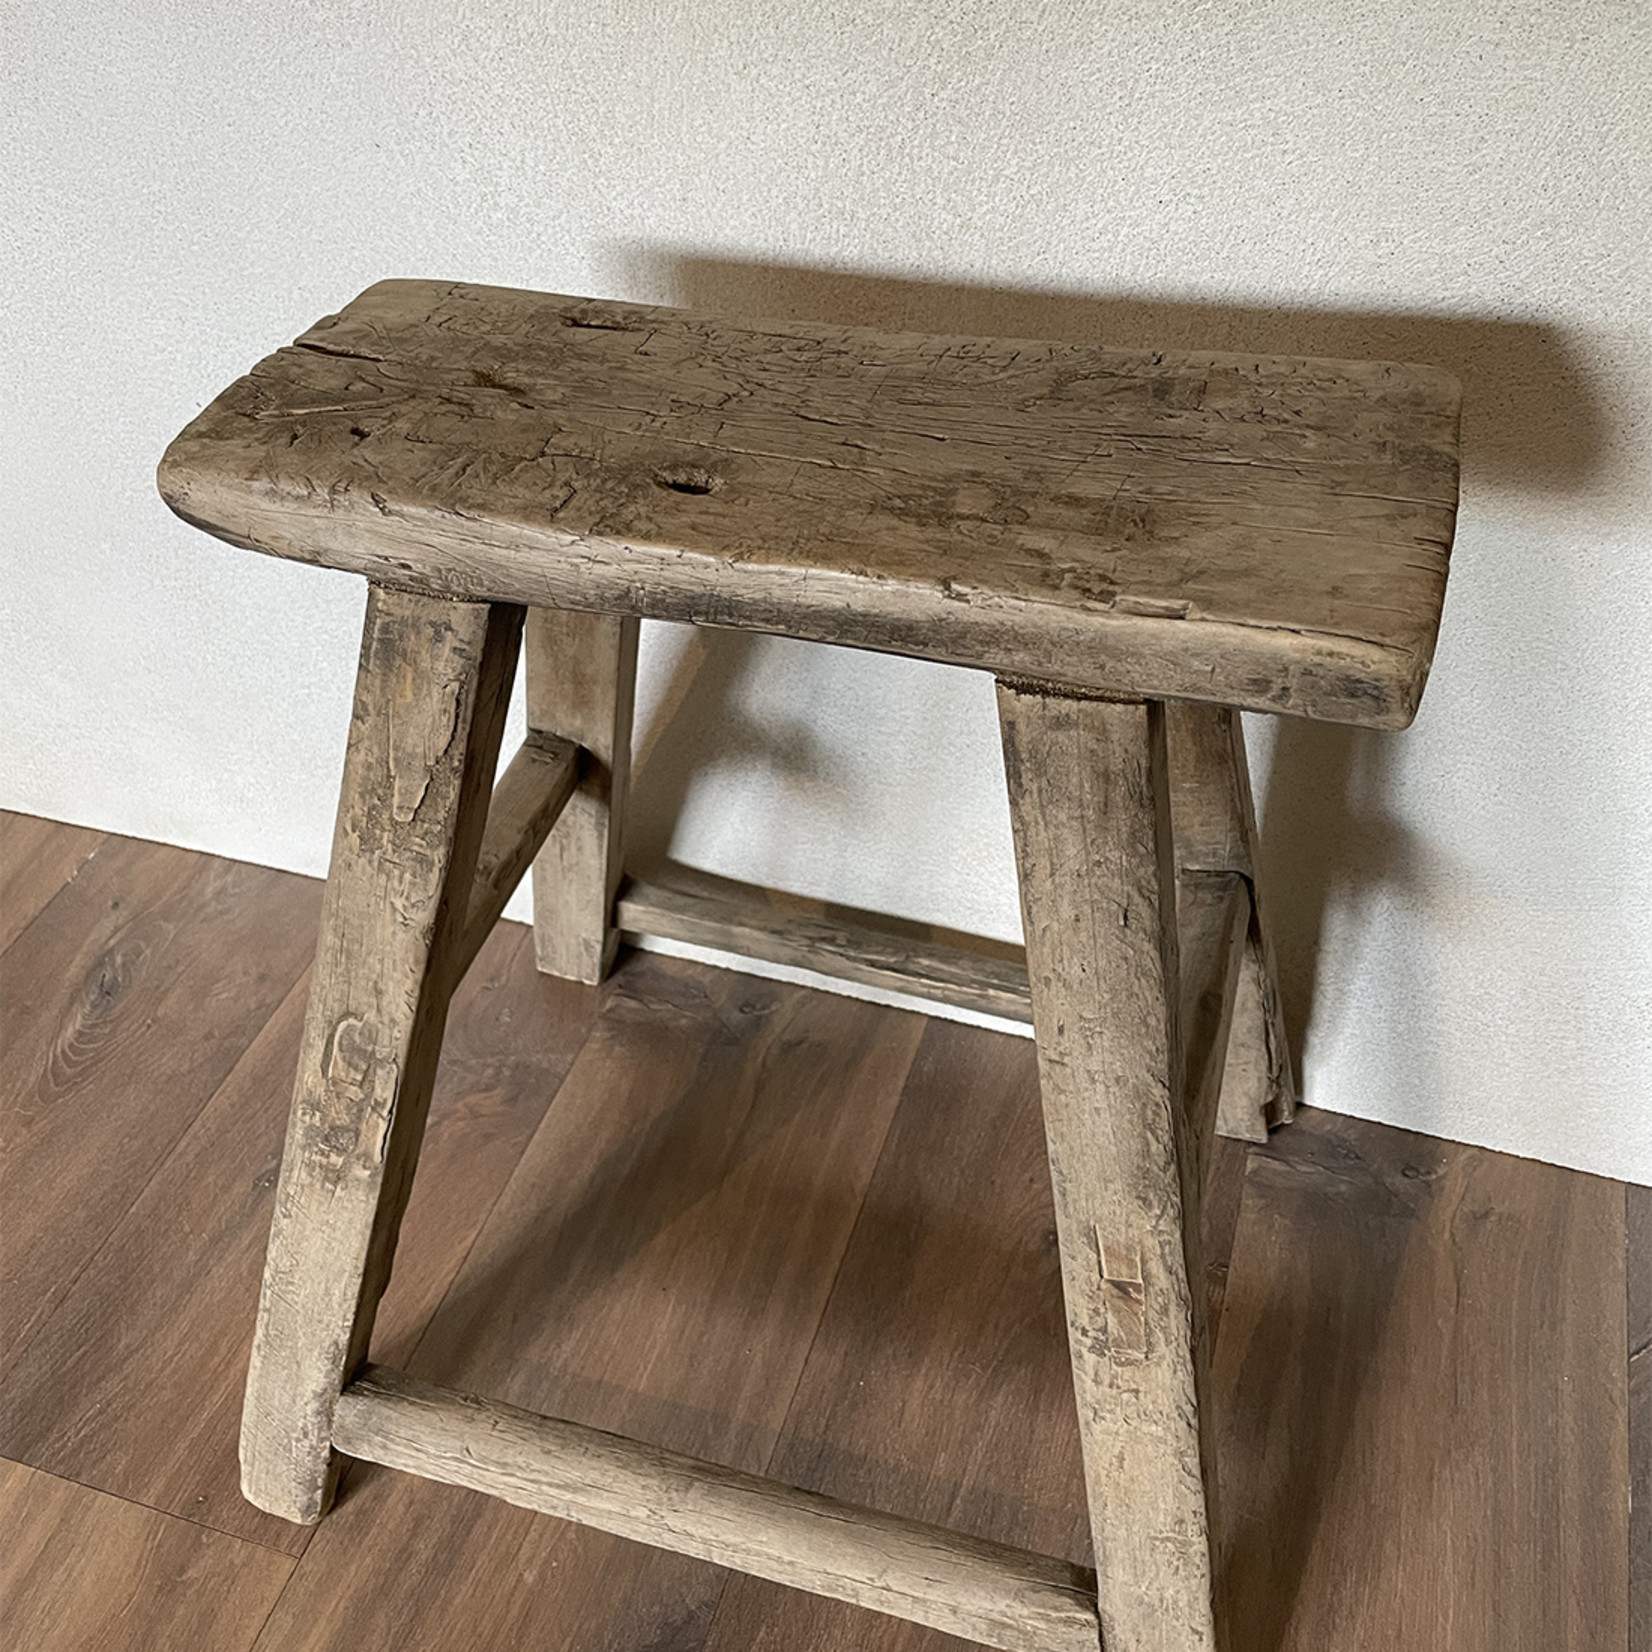 Olm stool °3